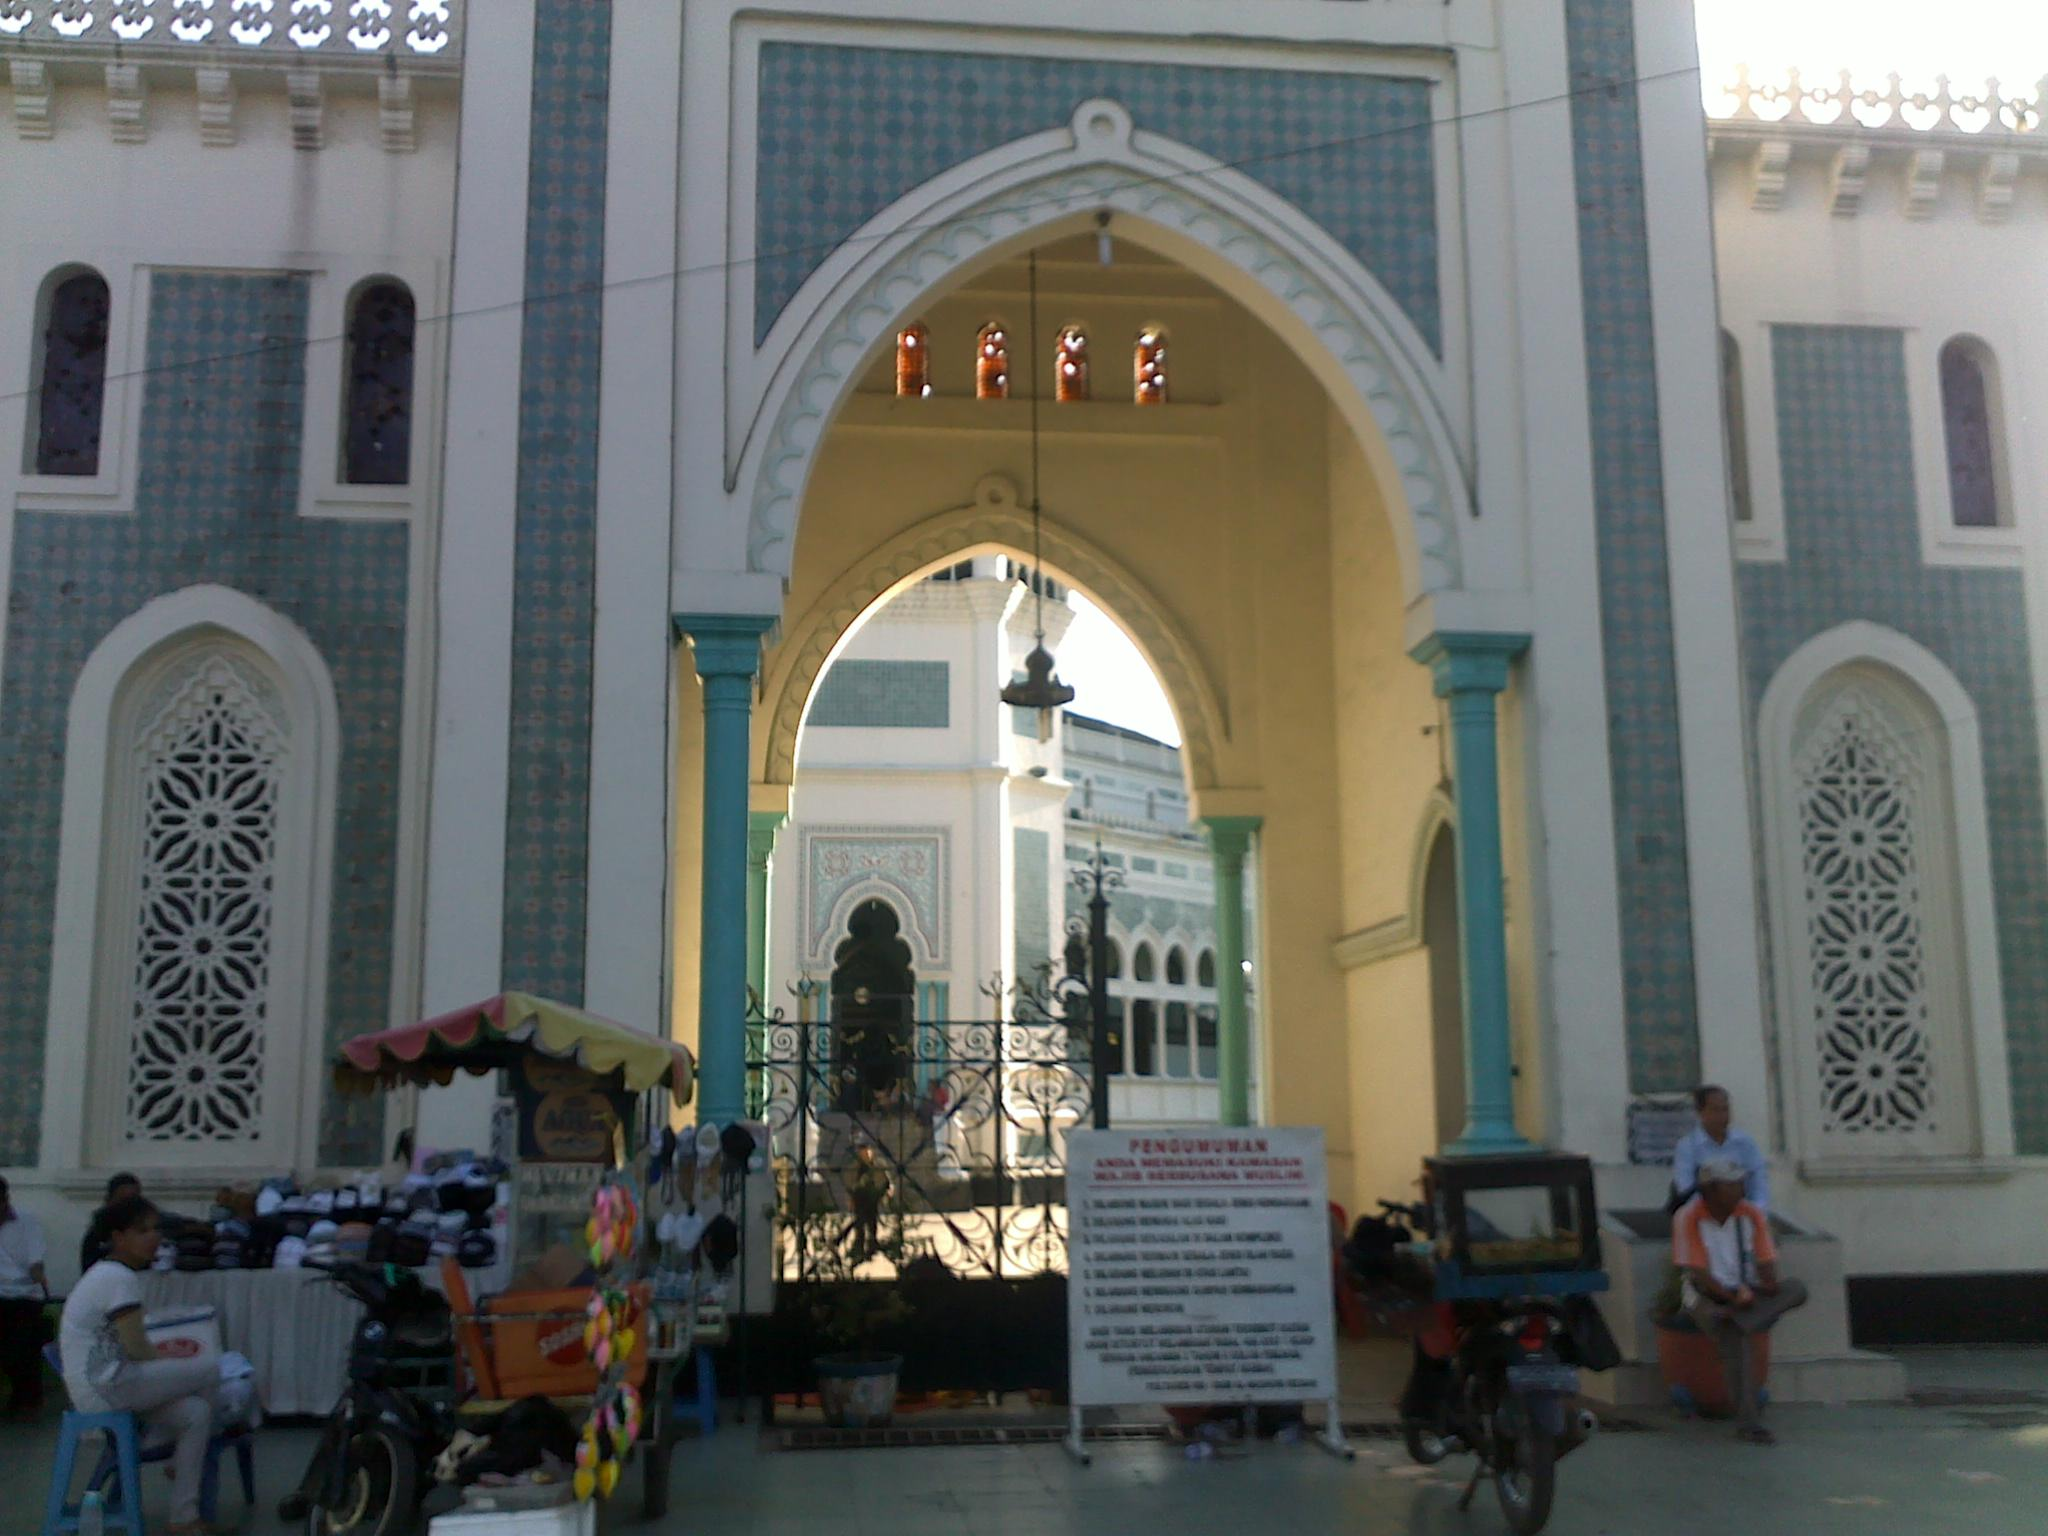 Gambar Pintu Gerbang Masjid Brad Erva Doce Info